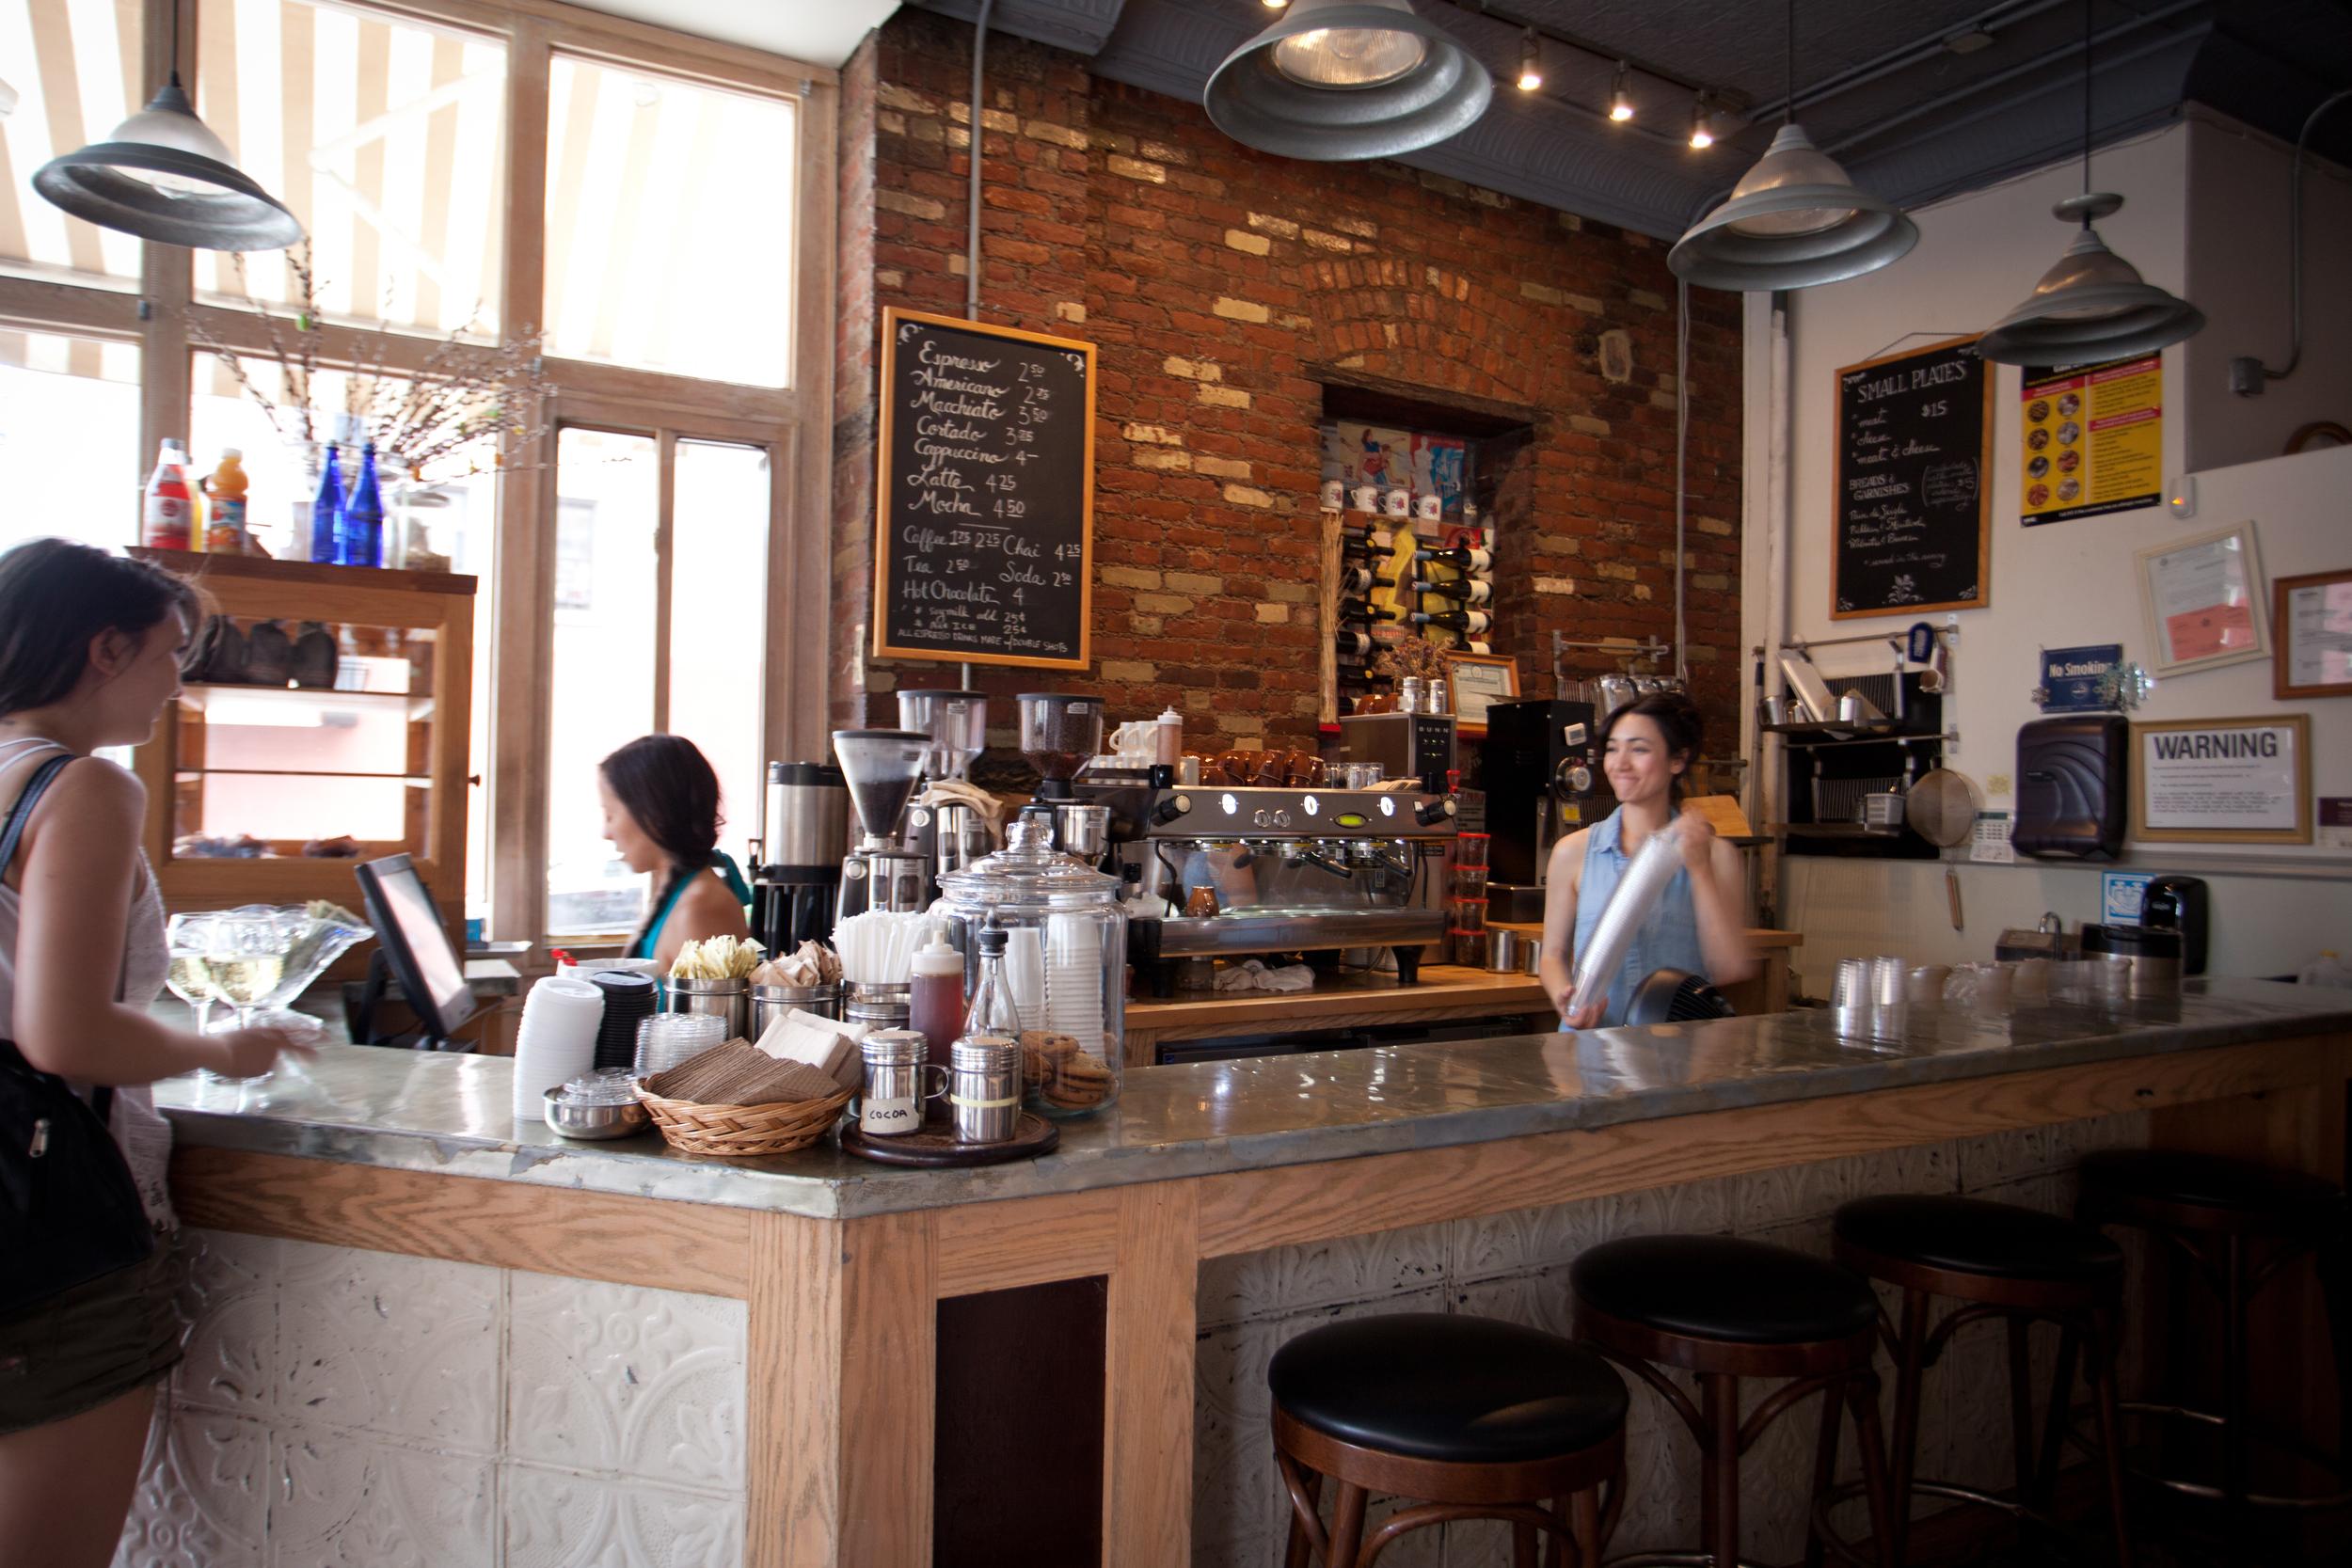 OST-Cafe-2-of-3.jpg